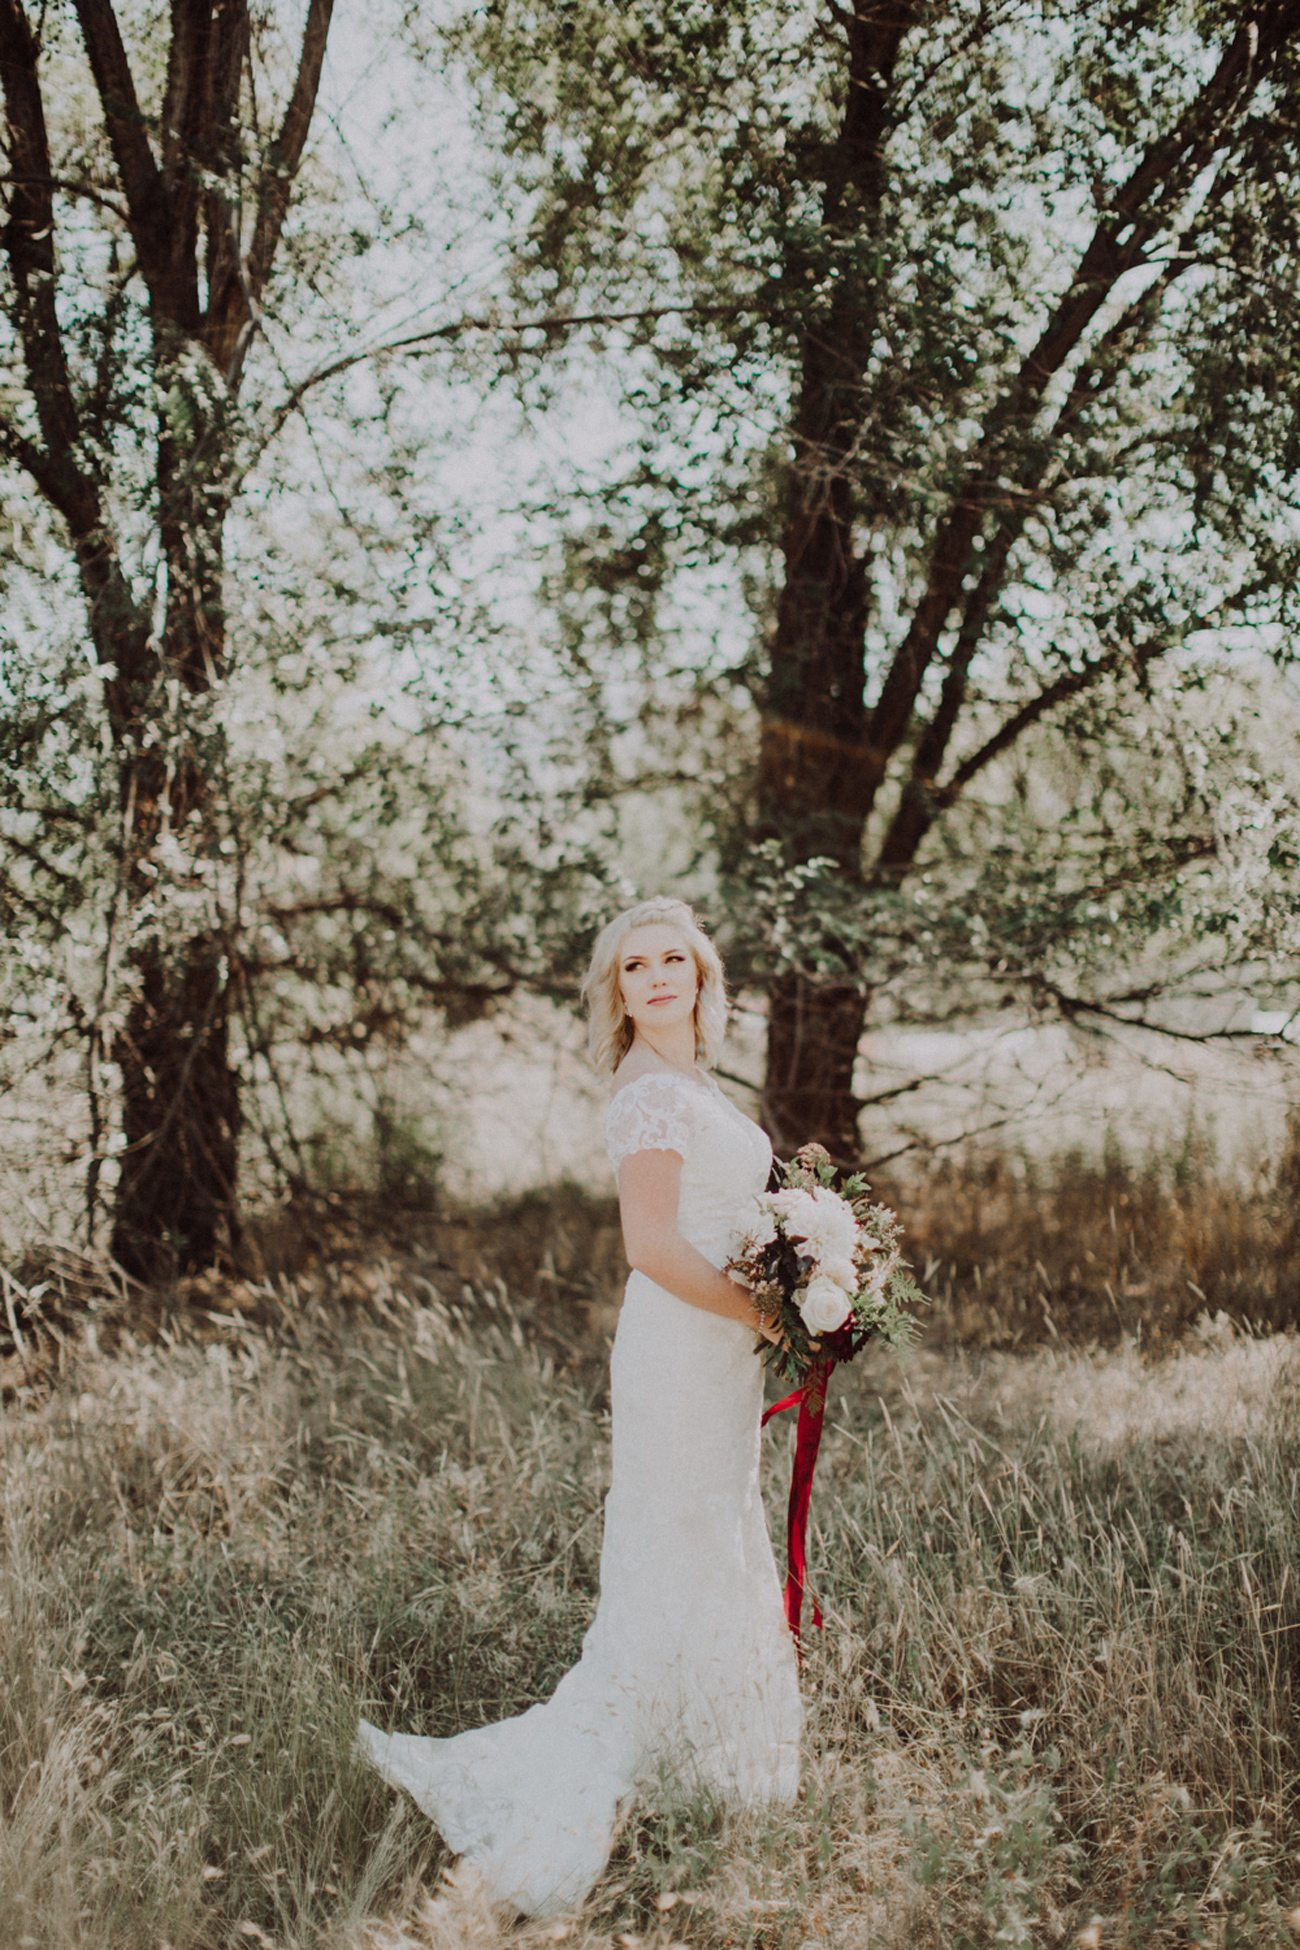 247-vernon-wedding-photographer